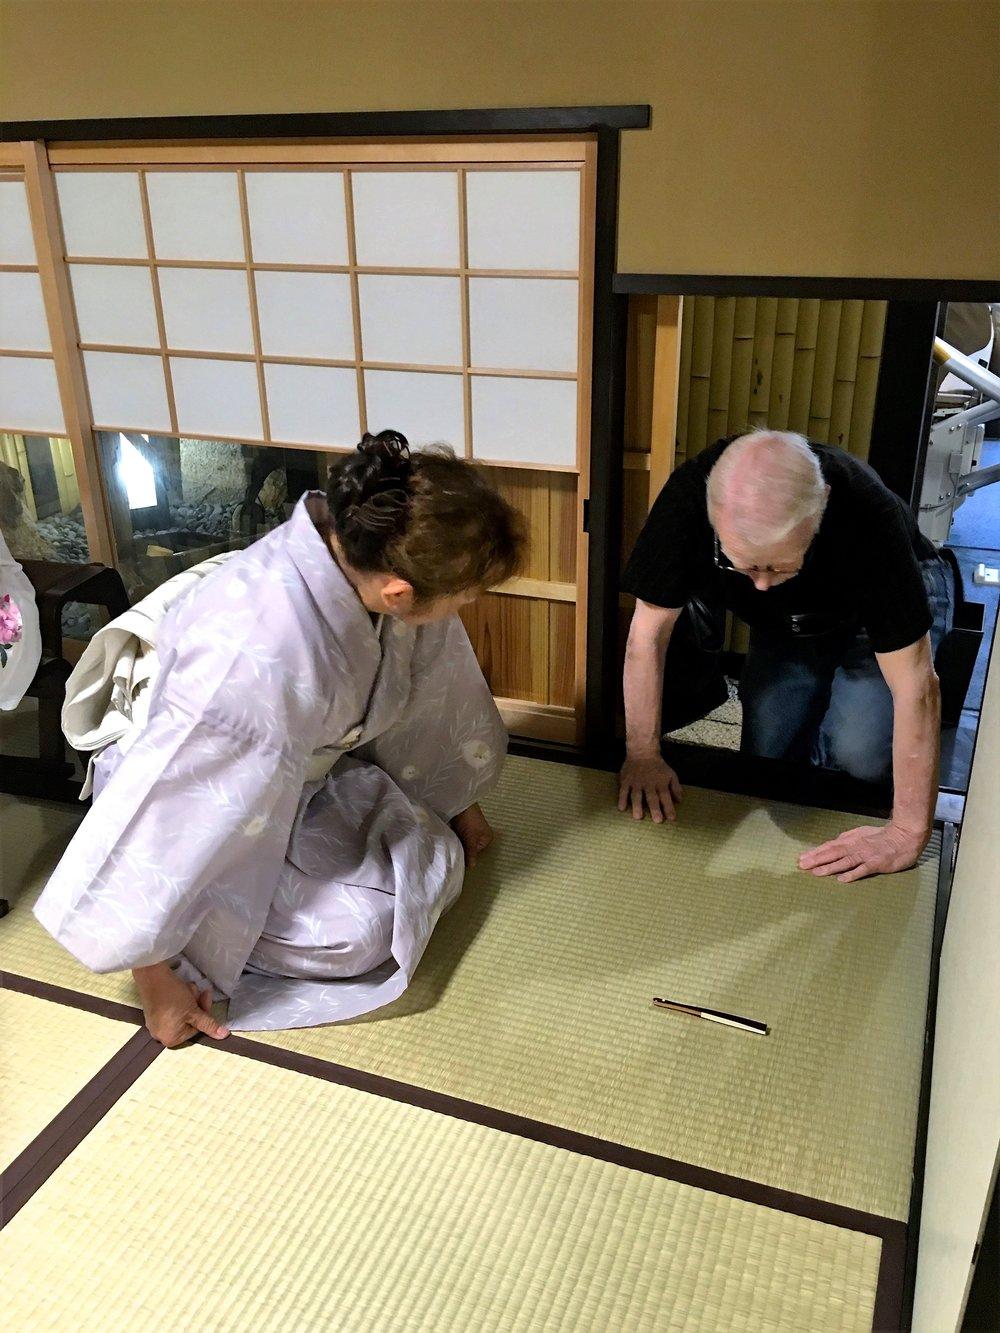 teri_Japan_Kyoto_TeaCeremony_spiritedtable_photo4.jpg